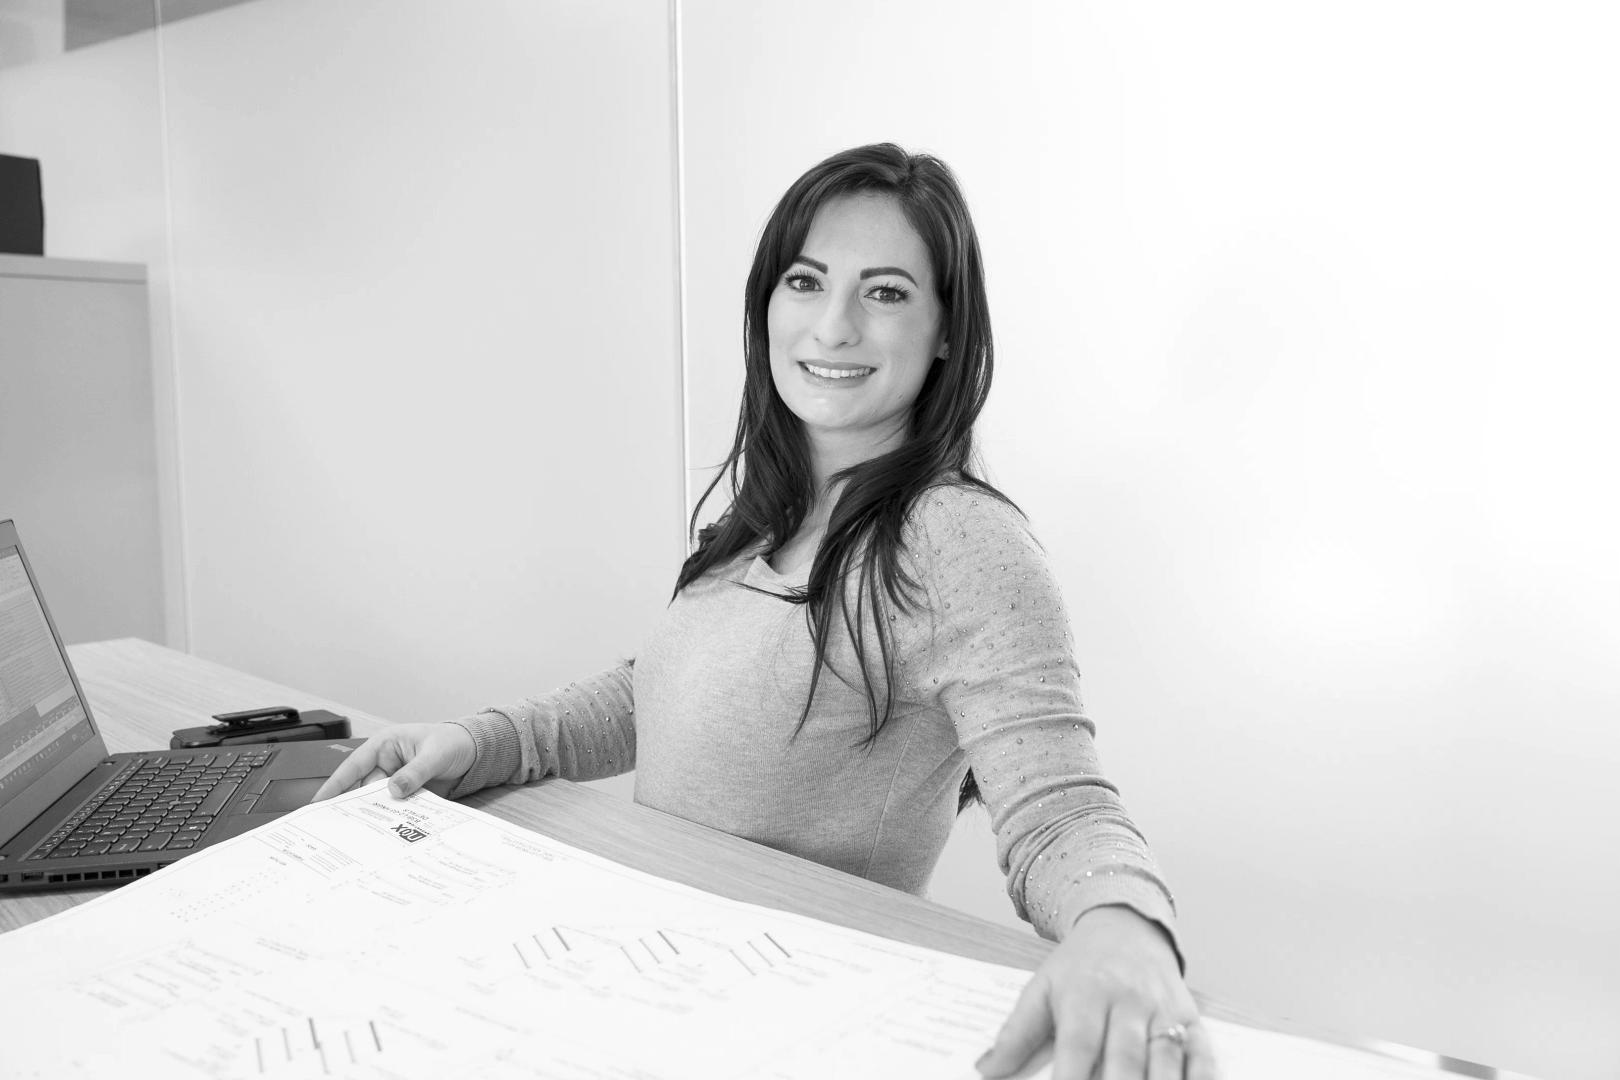 Women in Construction – Sarah Hancock